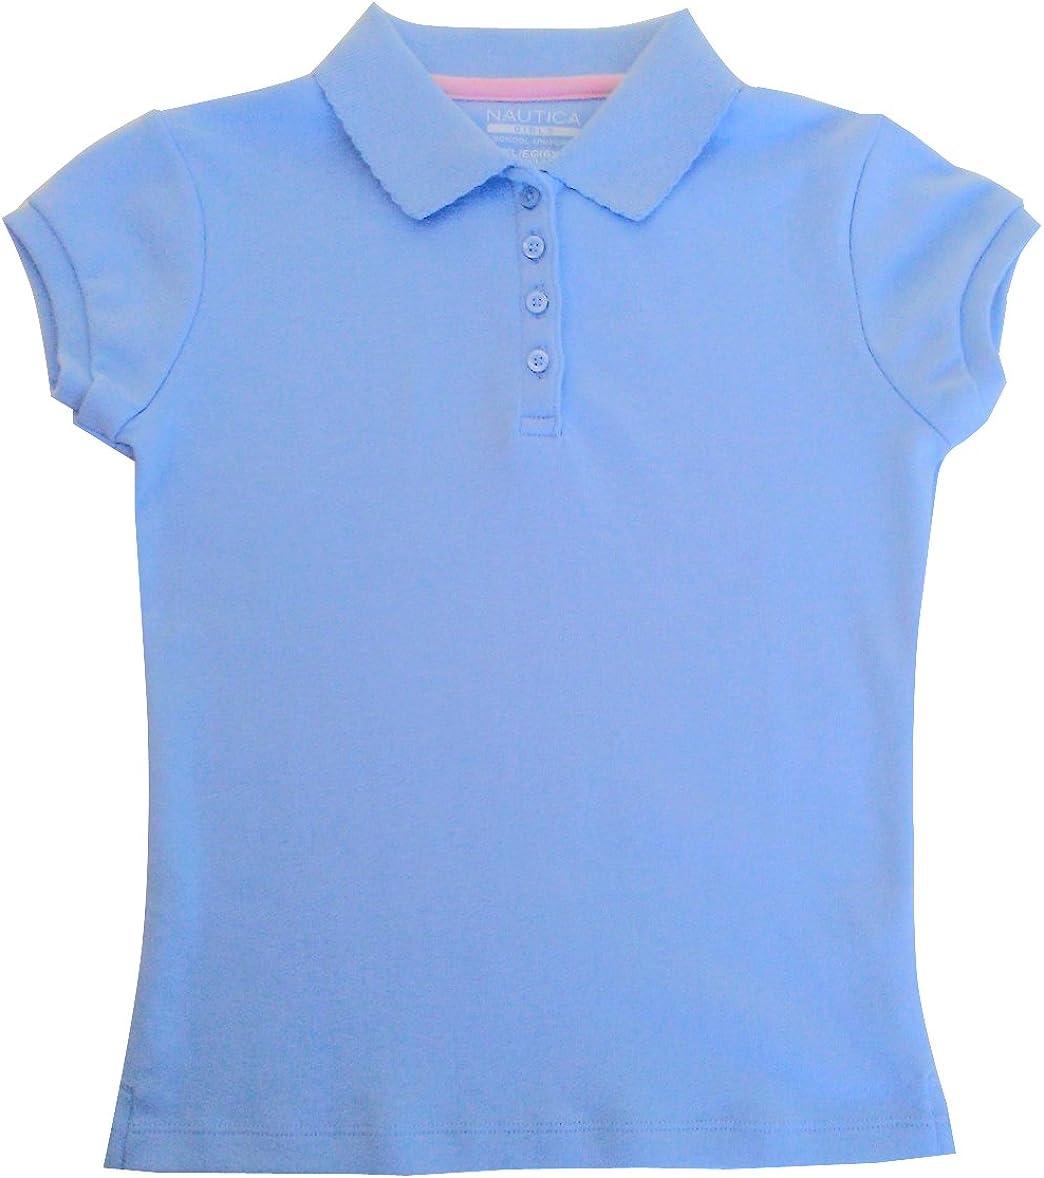 Nautica Kids Little Girls Size Unifo Blue Dedication Light Shirt Award-winning store 6X